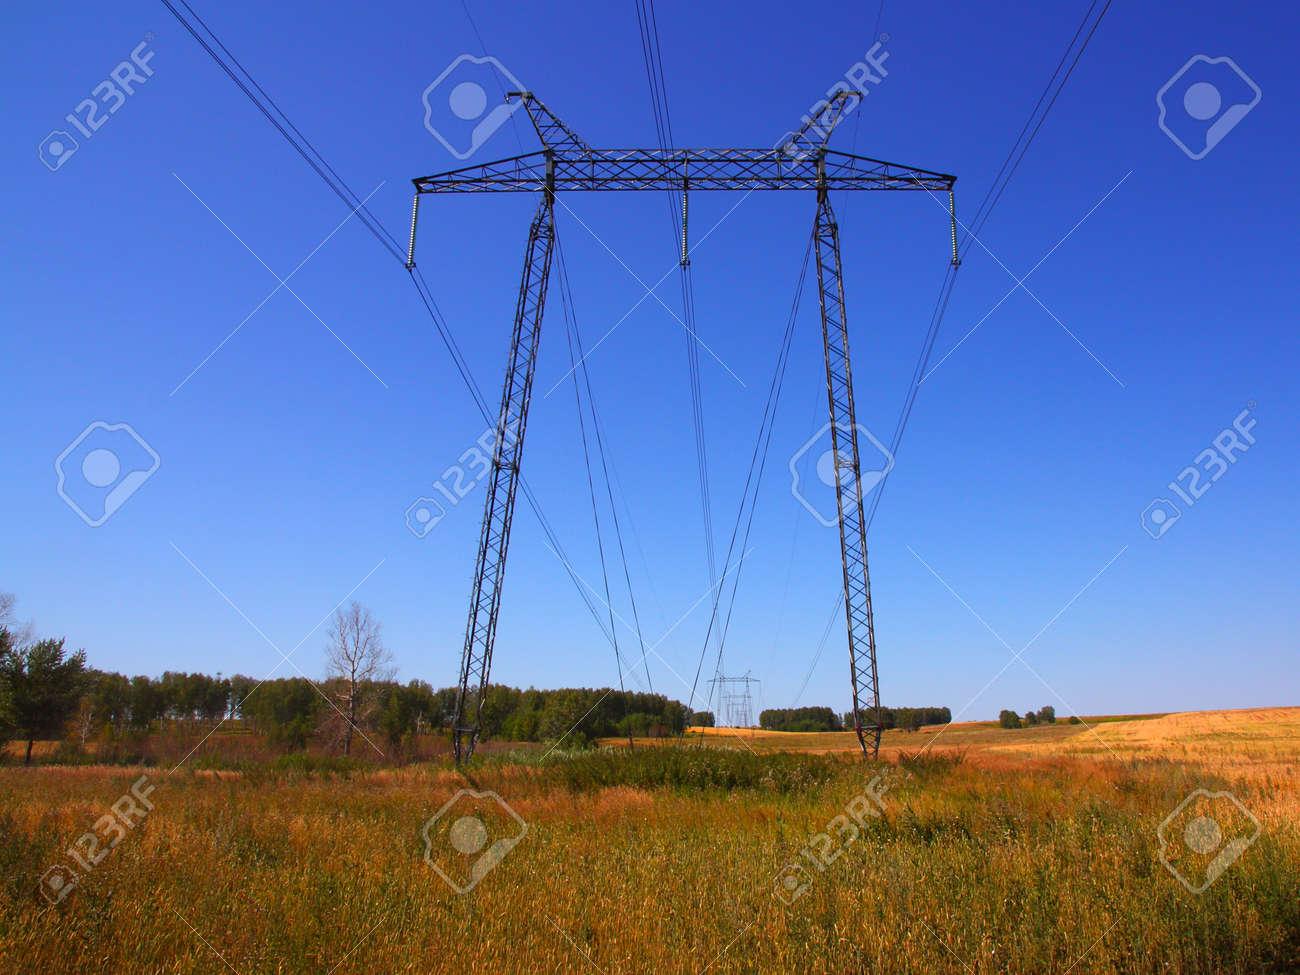 electrical grid near field Stock Photo - 10307651